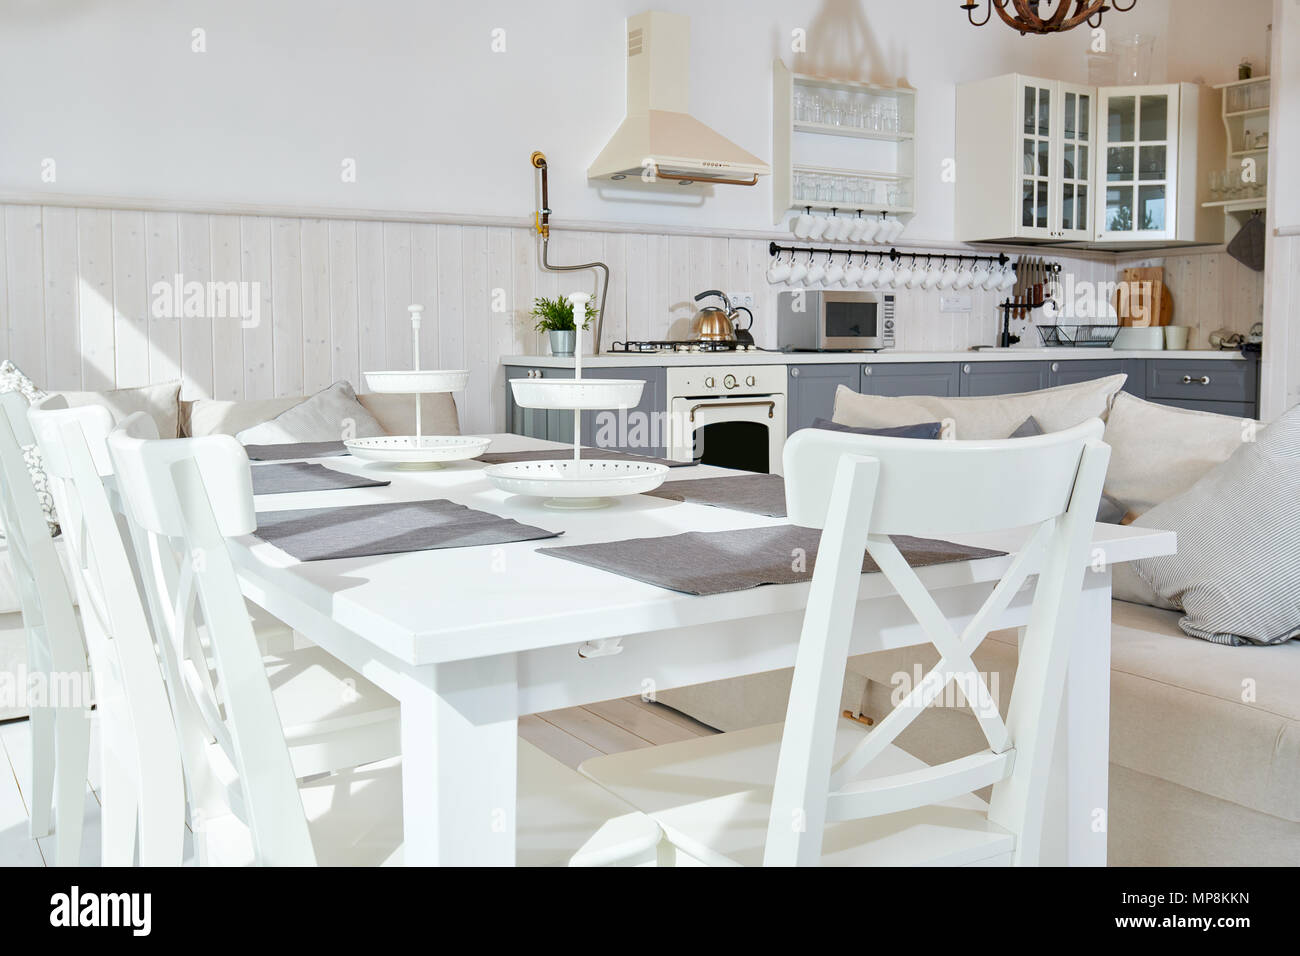 Arredare Open Space sunlit open kitchen interior design with white furniture and